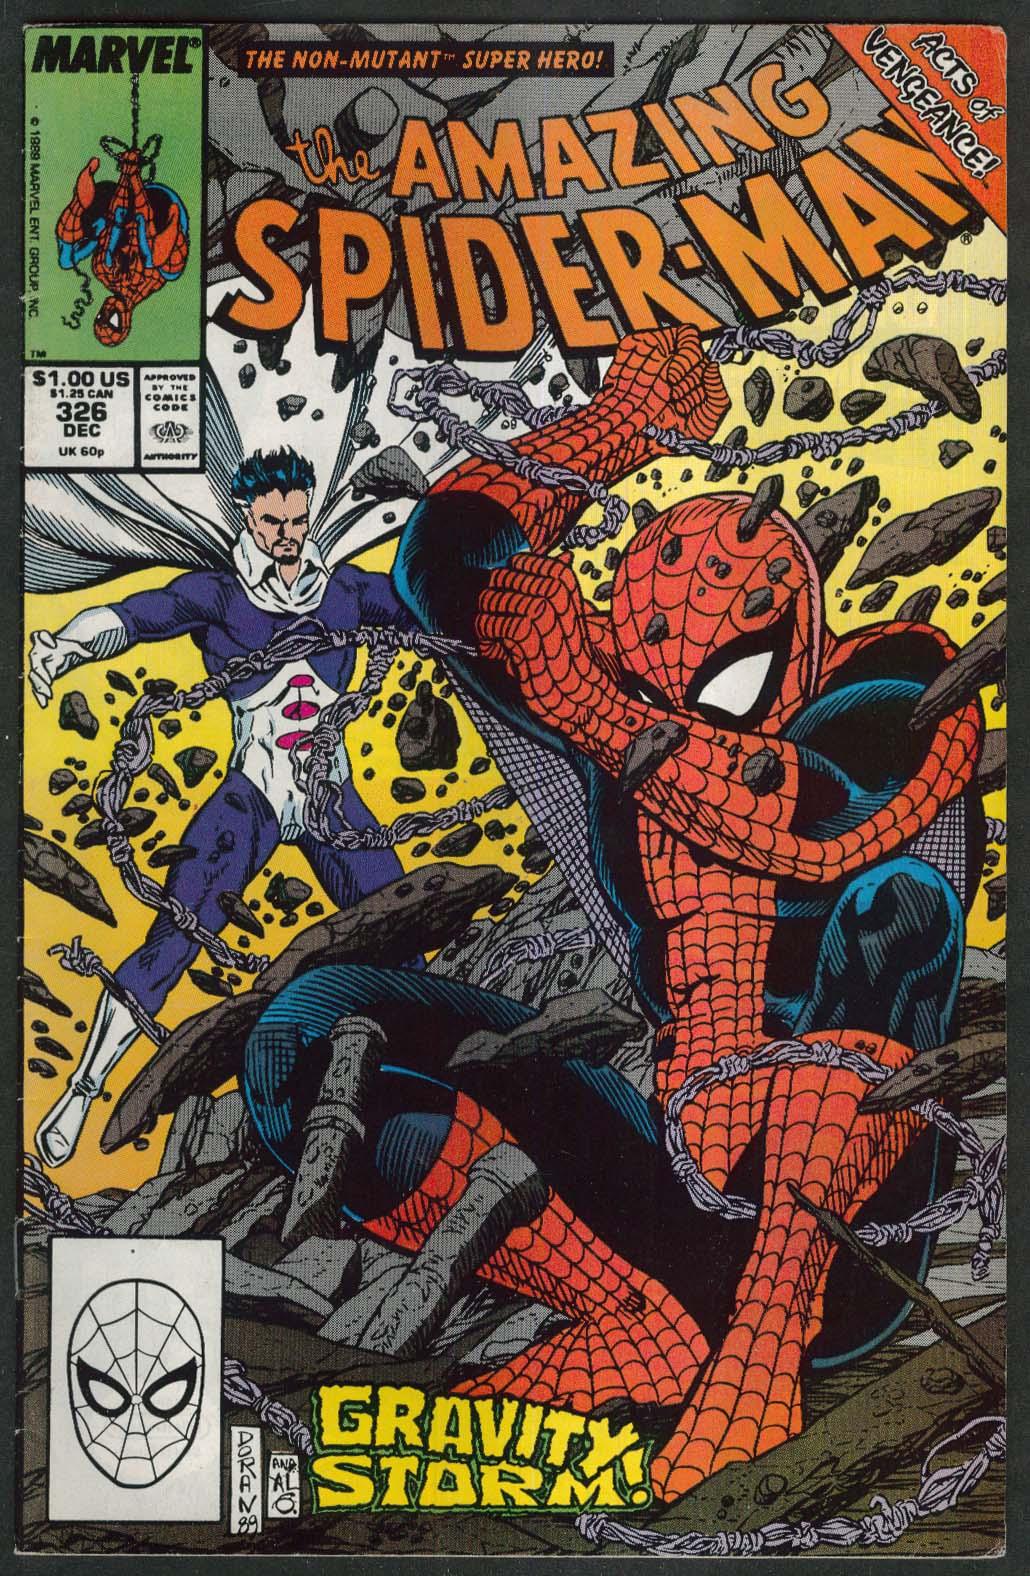 AMAZING SPIDER-MAN #326 Marvel comic book 12 1989